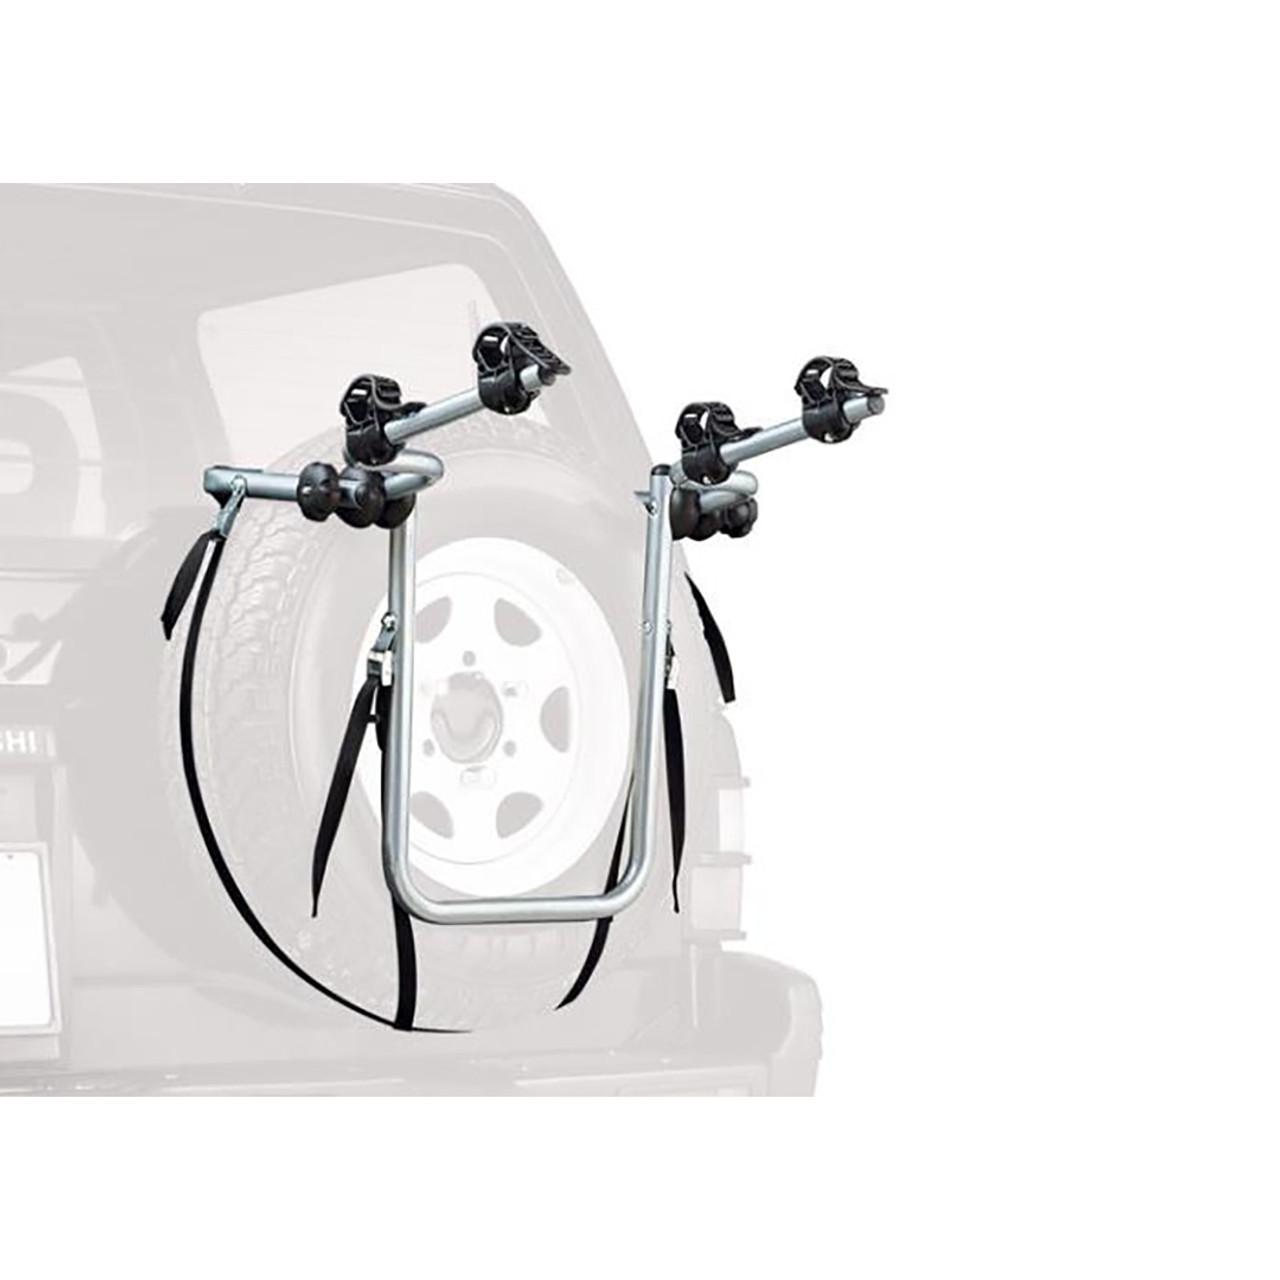 Peruzzo Car Racks Spare Tyre Fitting 4X4 2 Bike Carrier Silver